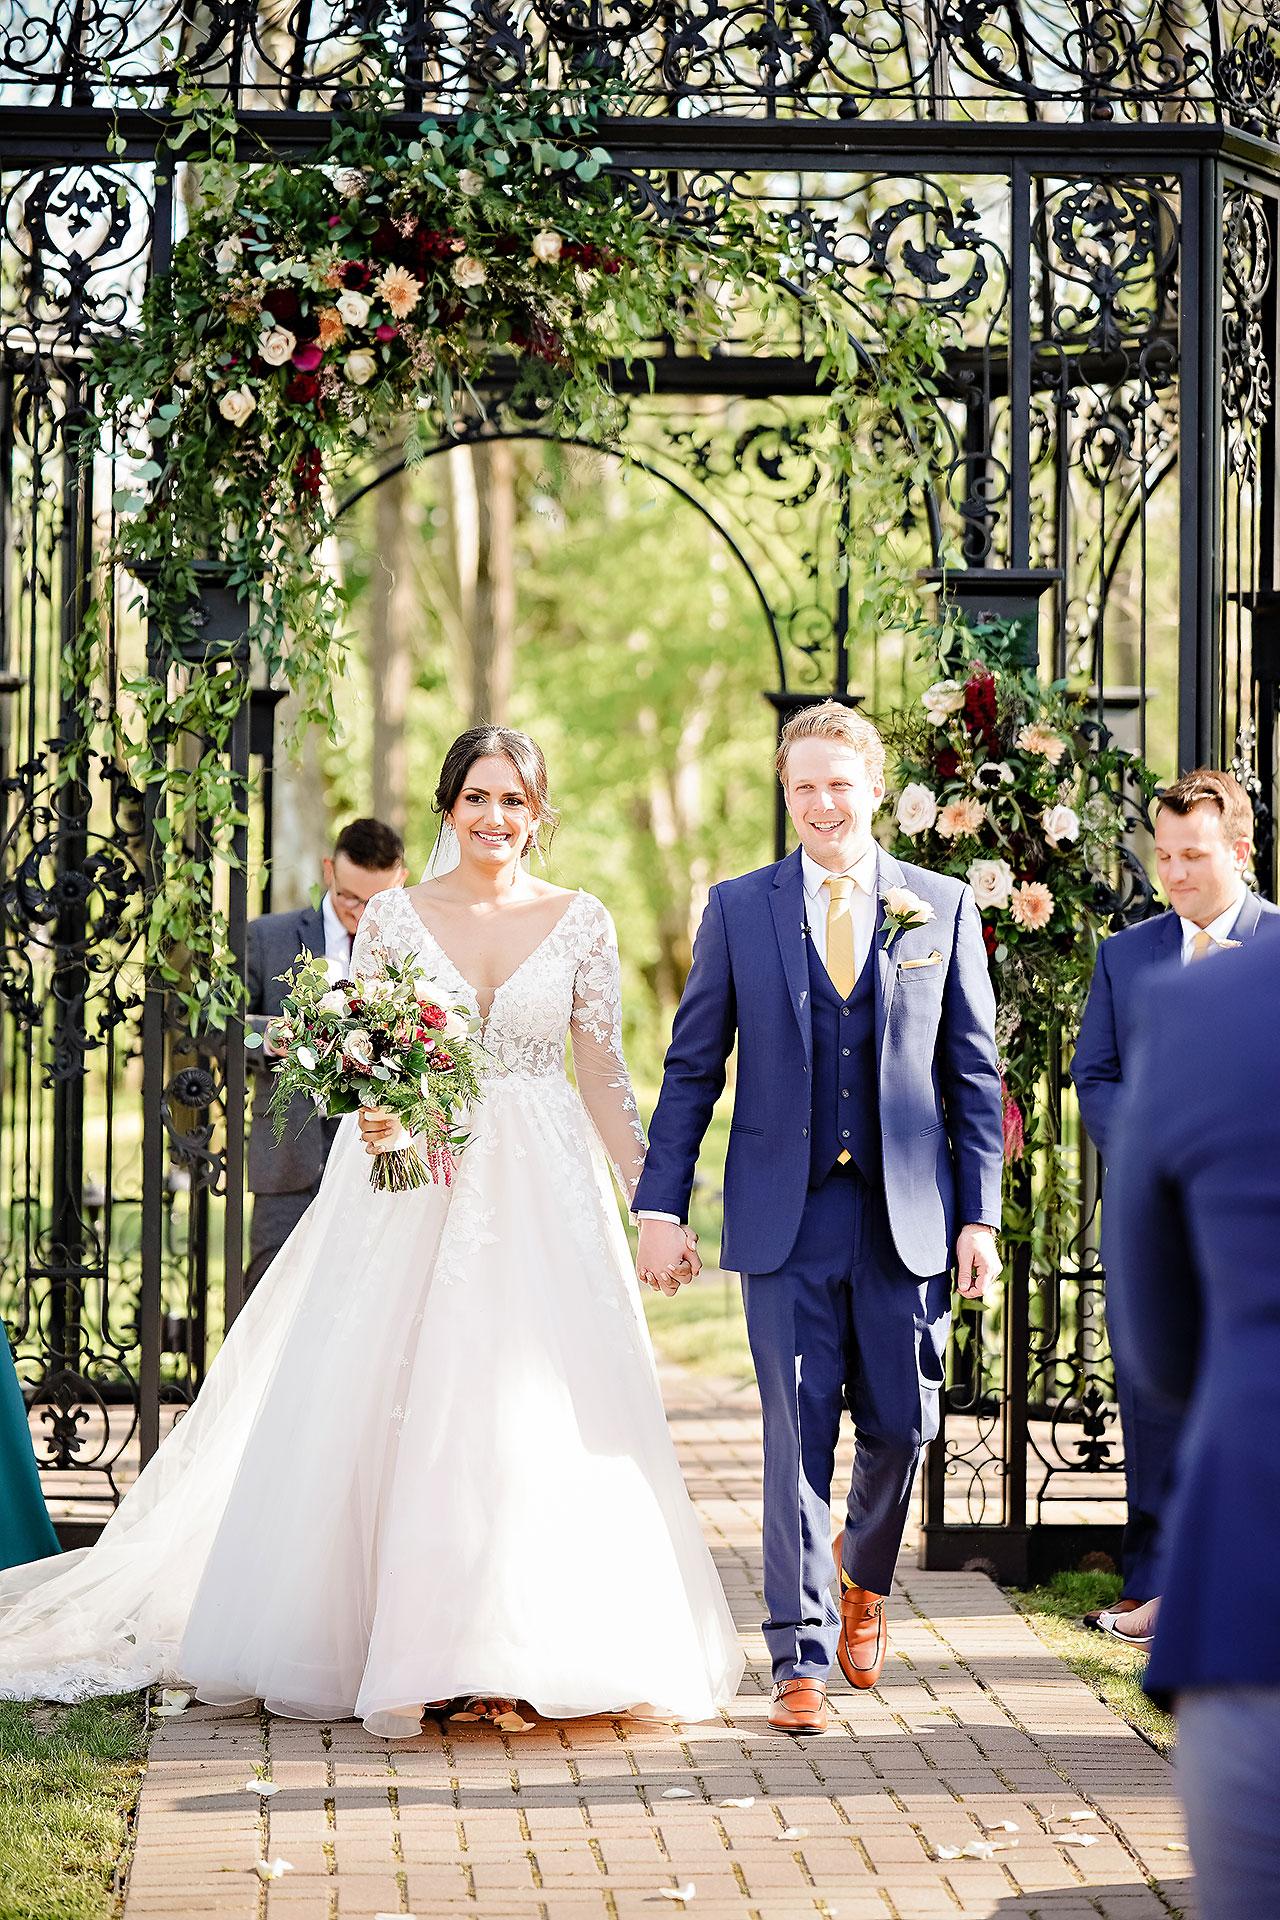 Nadia Parker Black Iris Estate Carmel Indiana Wedding May 2021 186